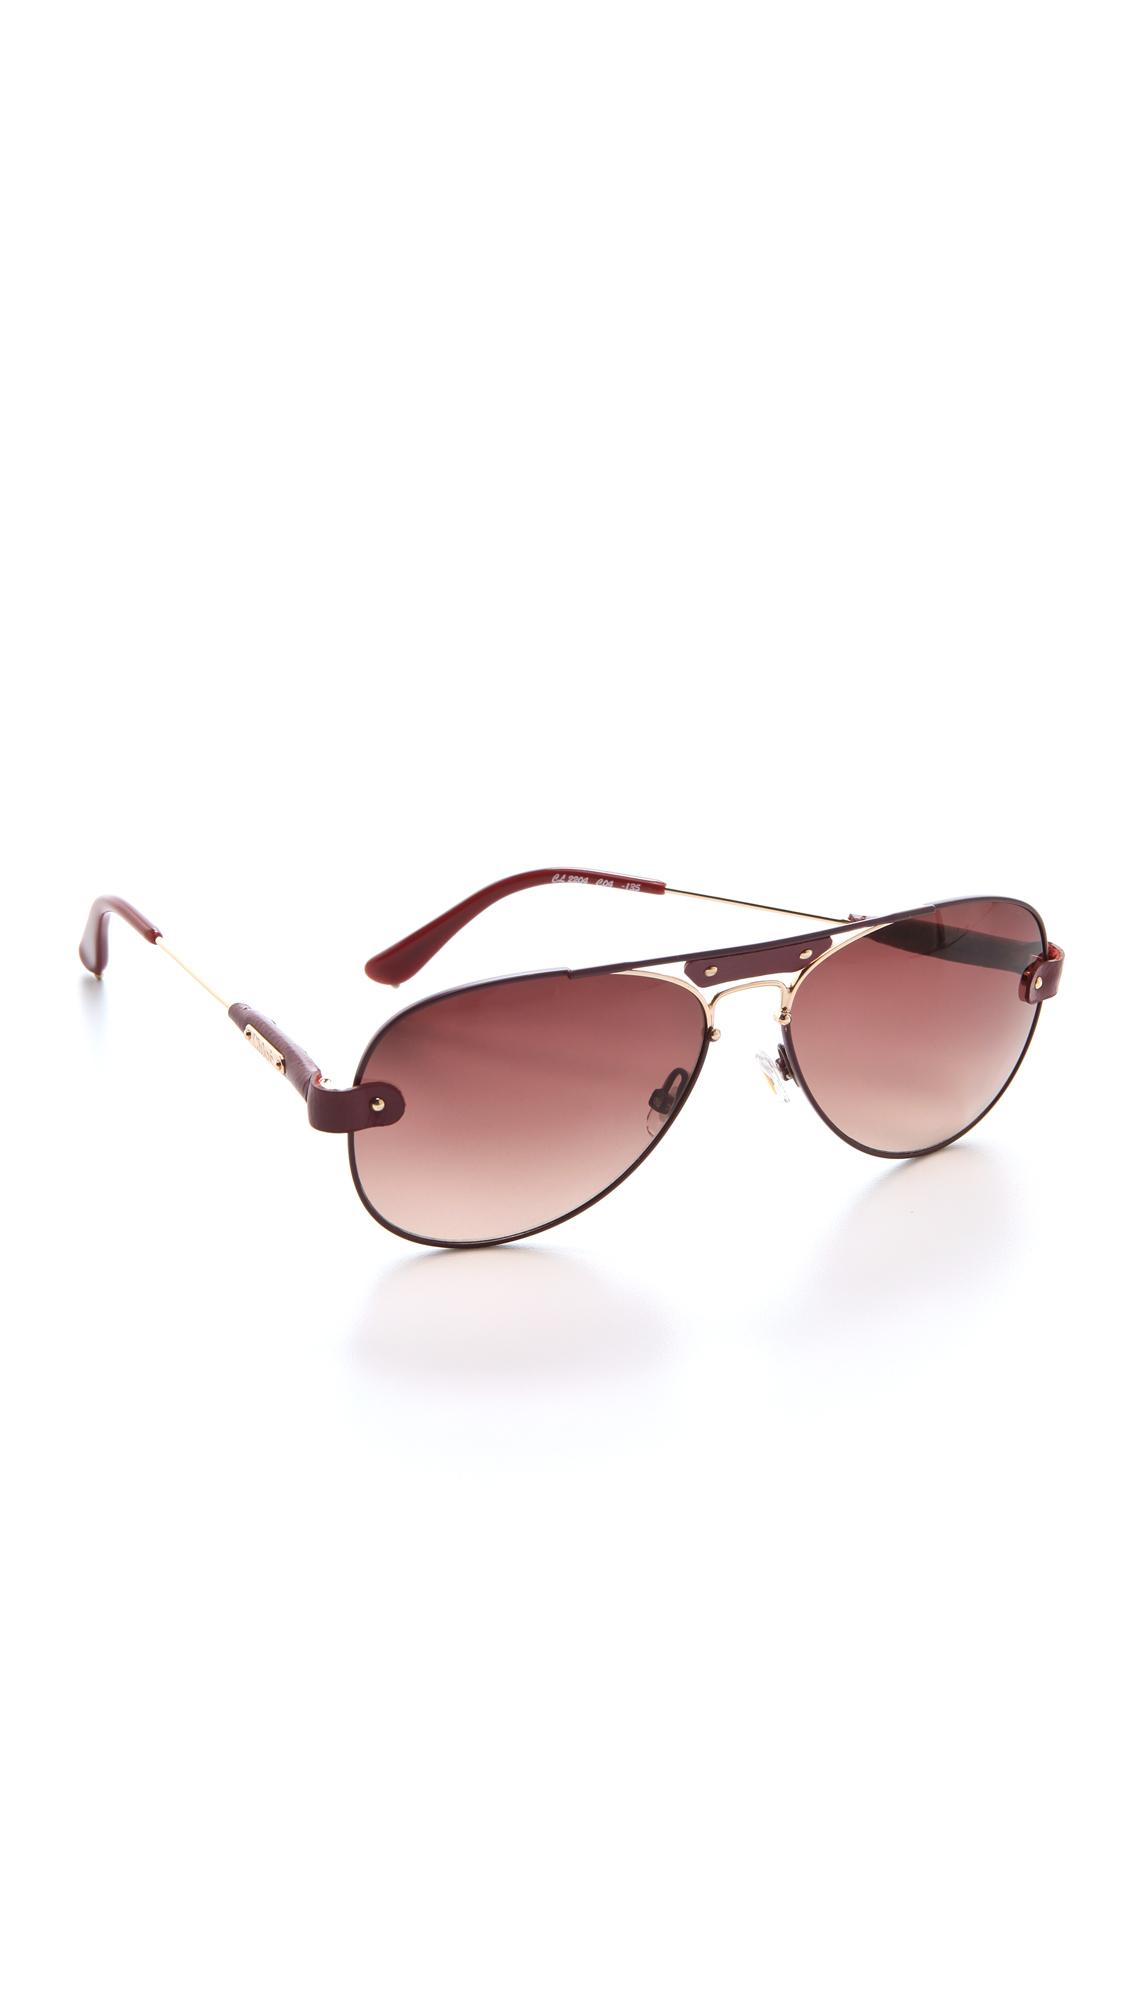 c0ec30495e33 Chloe Tamaris Aviator Sunglasses on PopScreen